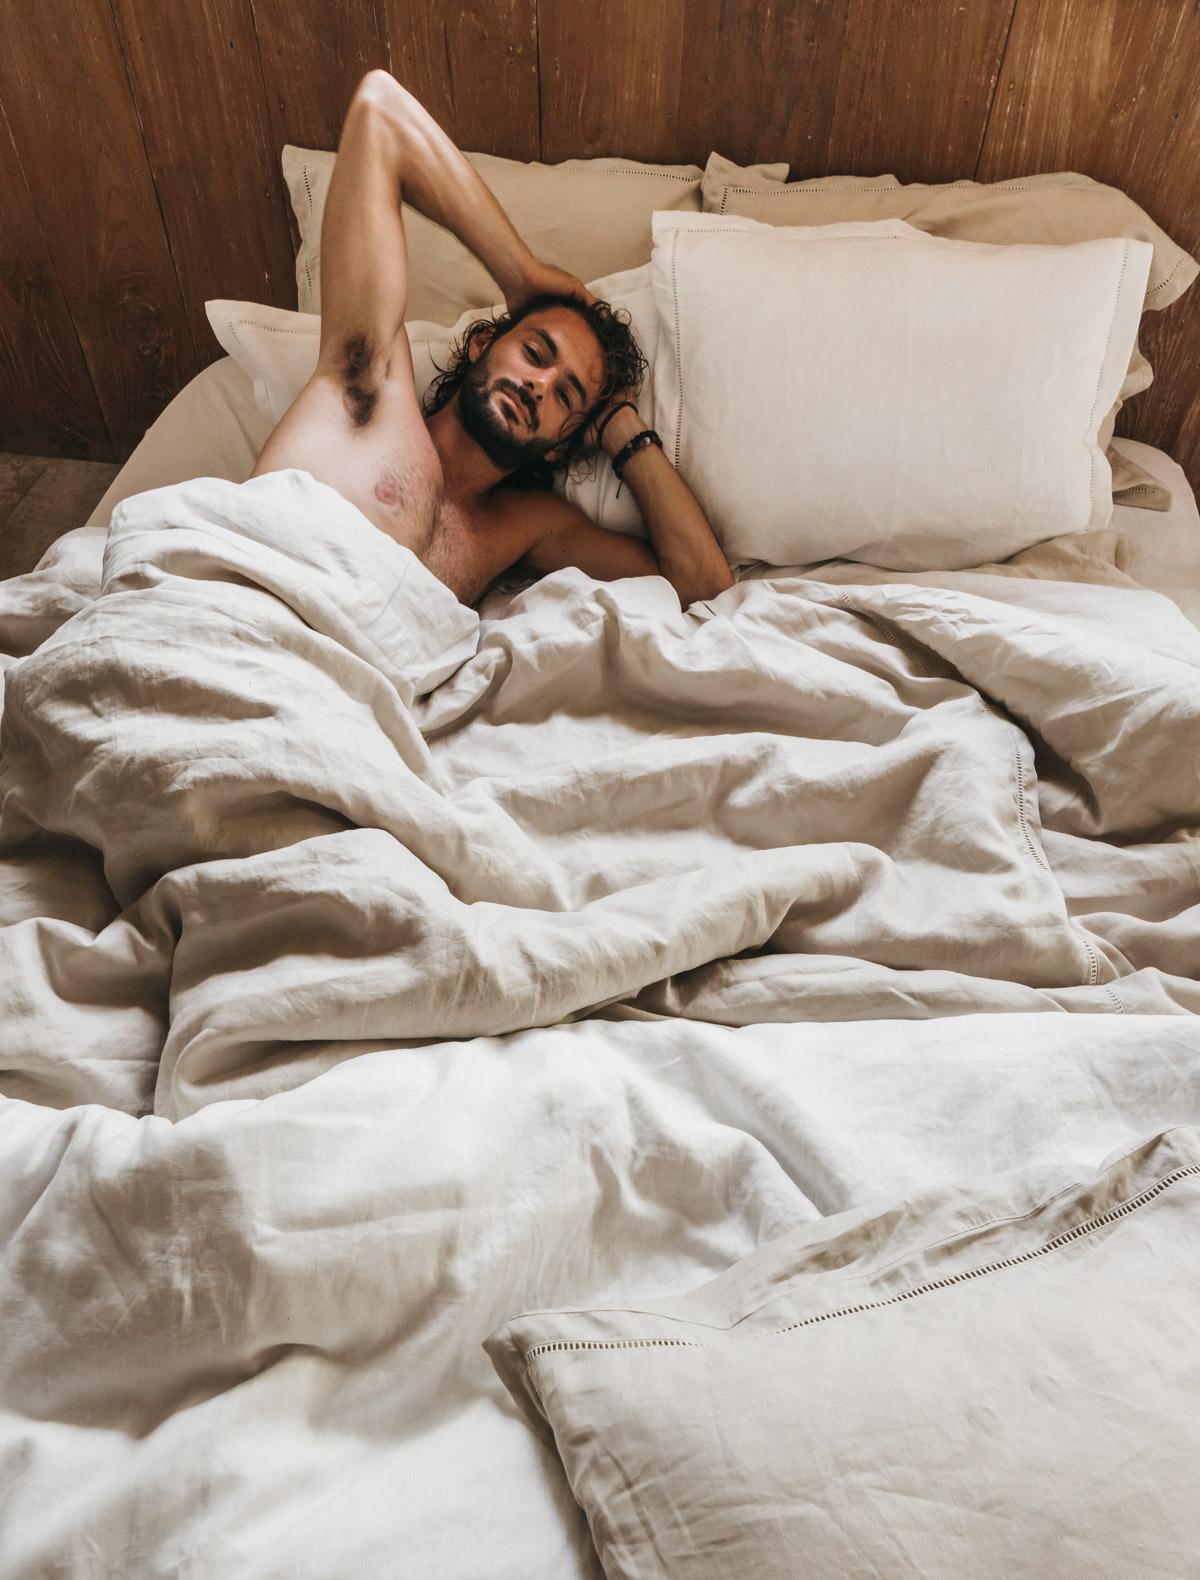 Keira-Mason-in-between-the-sheets-man-sleeping.jpg